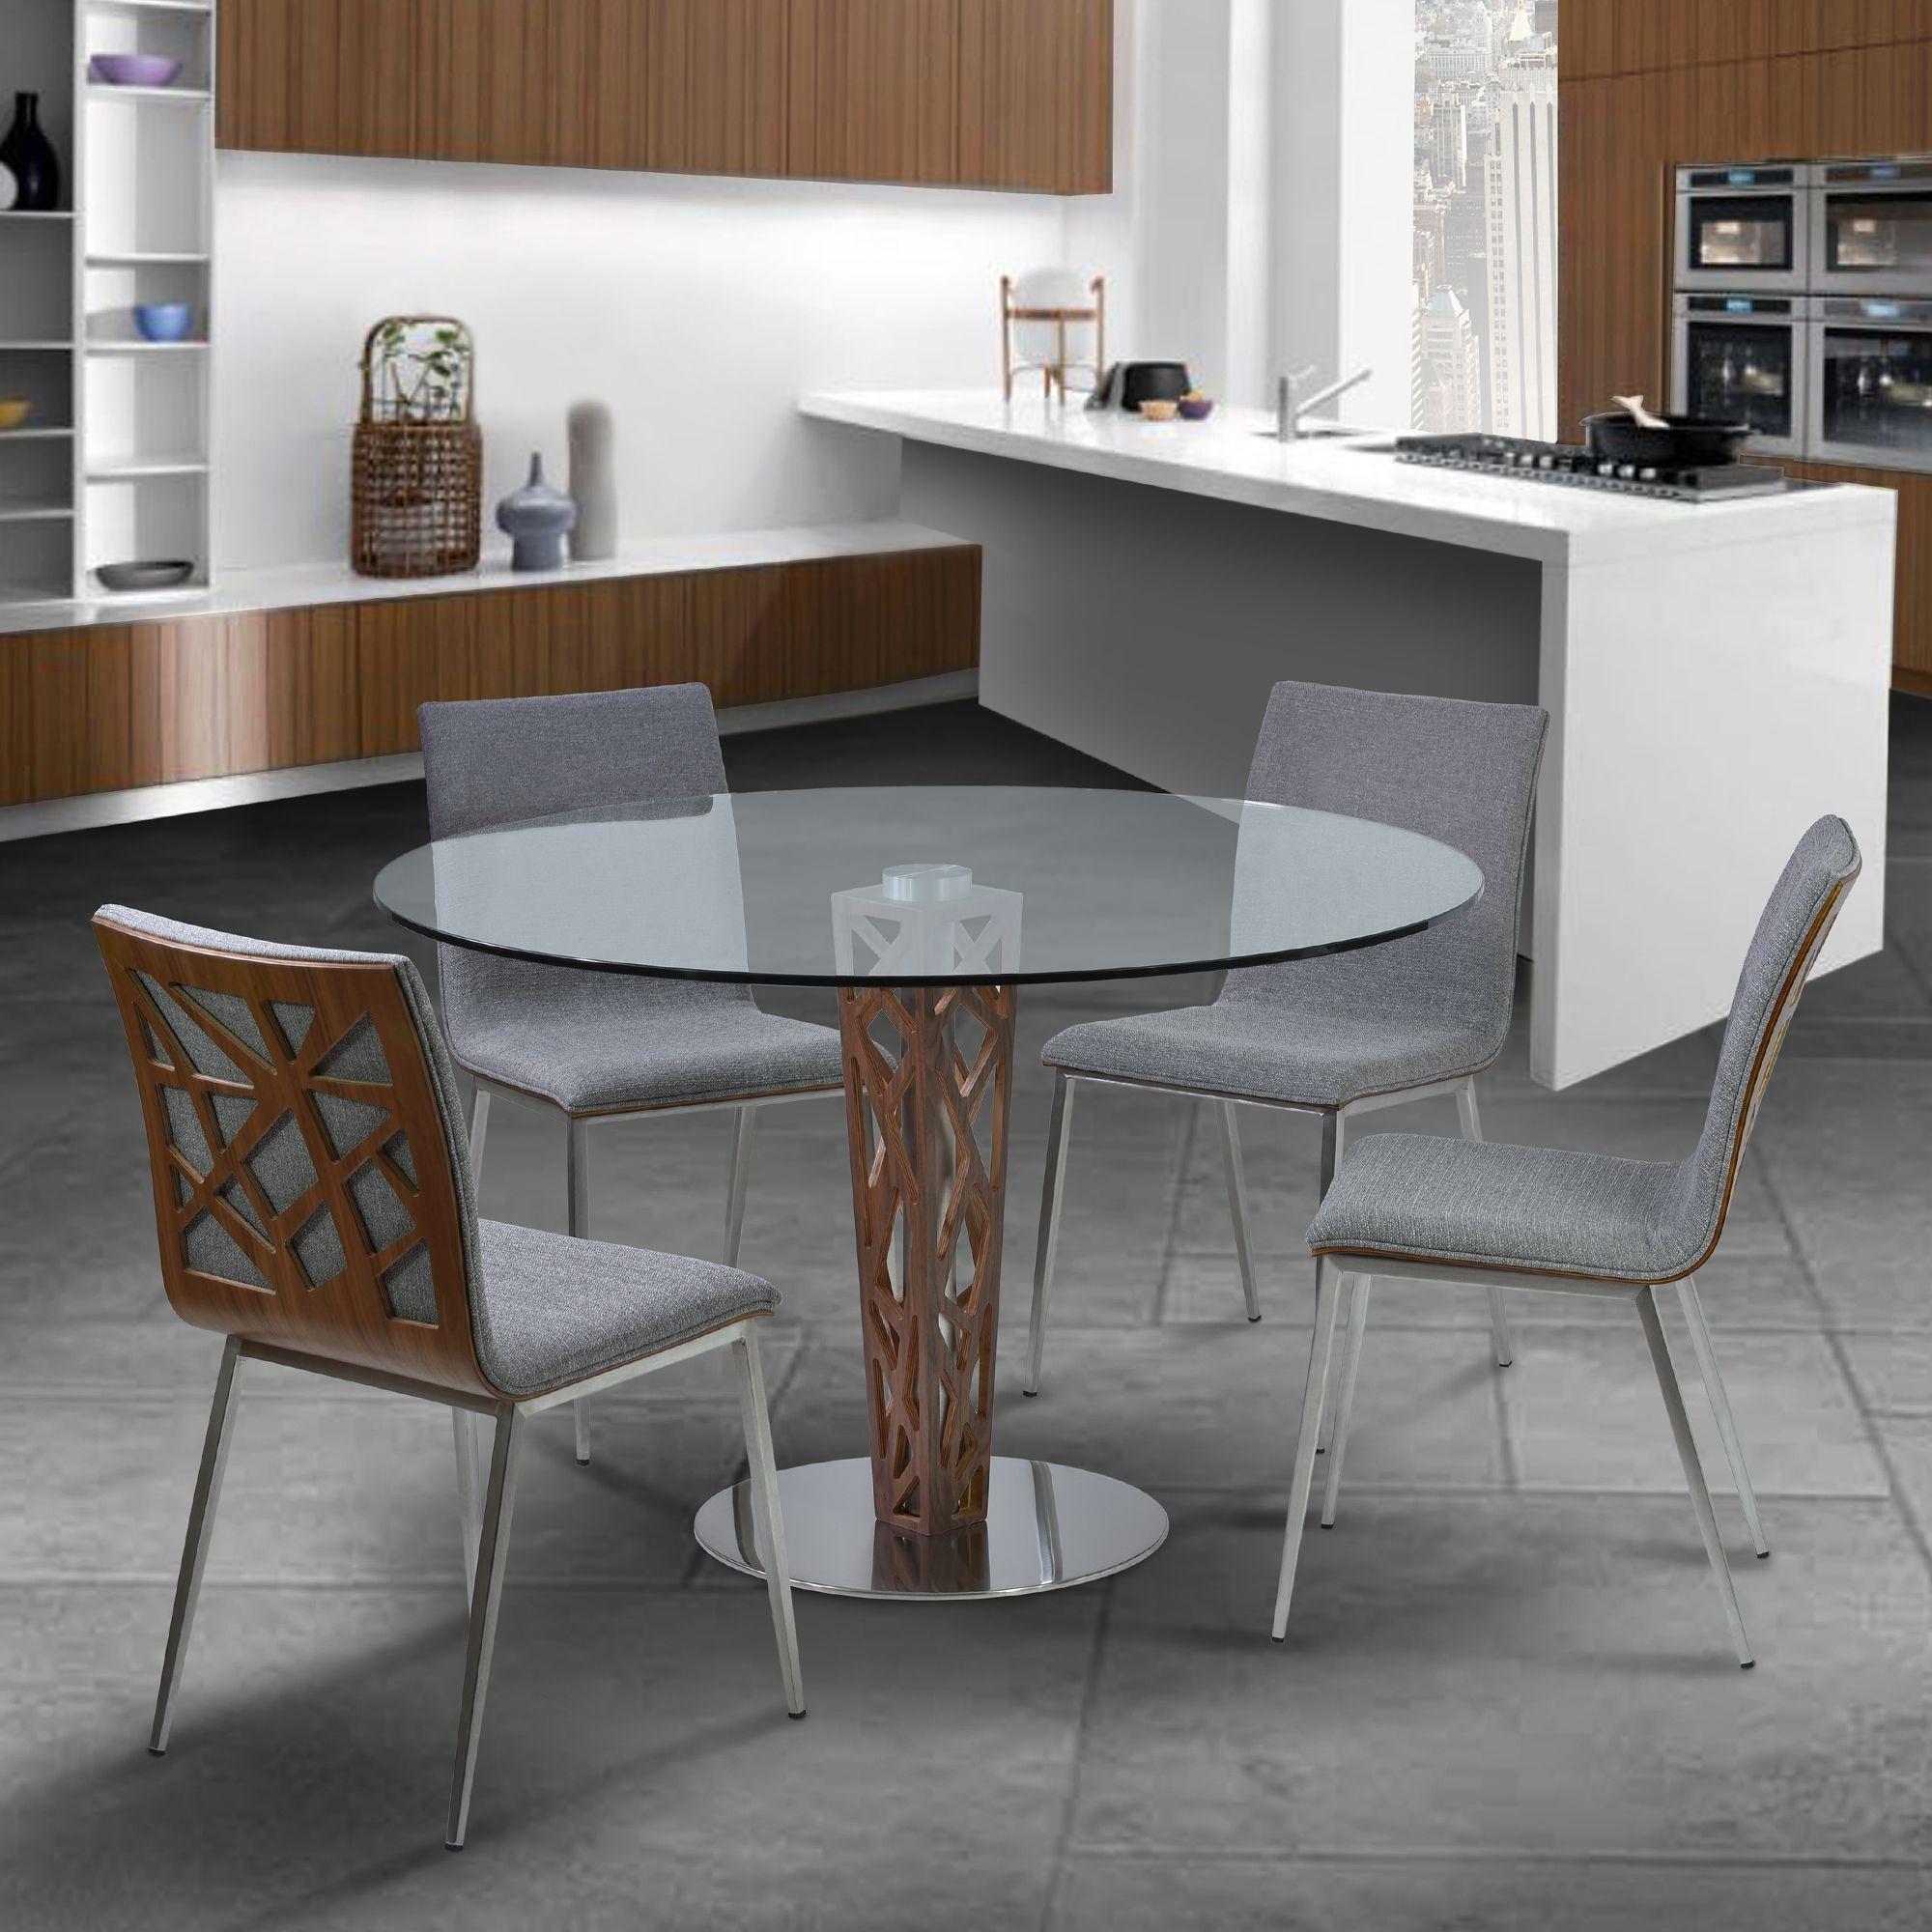 crystal 48 clear tempered glass top round dining room set. Black Bedroom Furniture Sets. Home Design Ideas